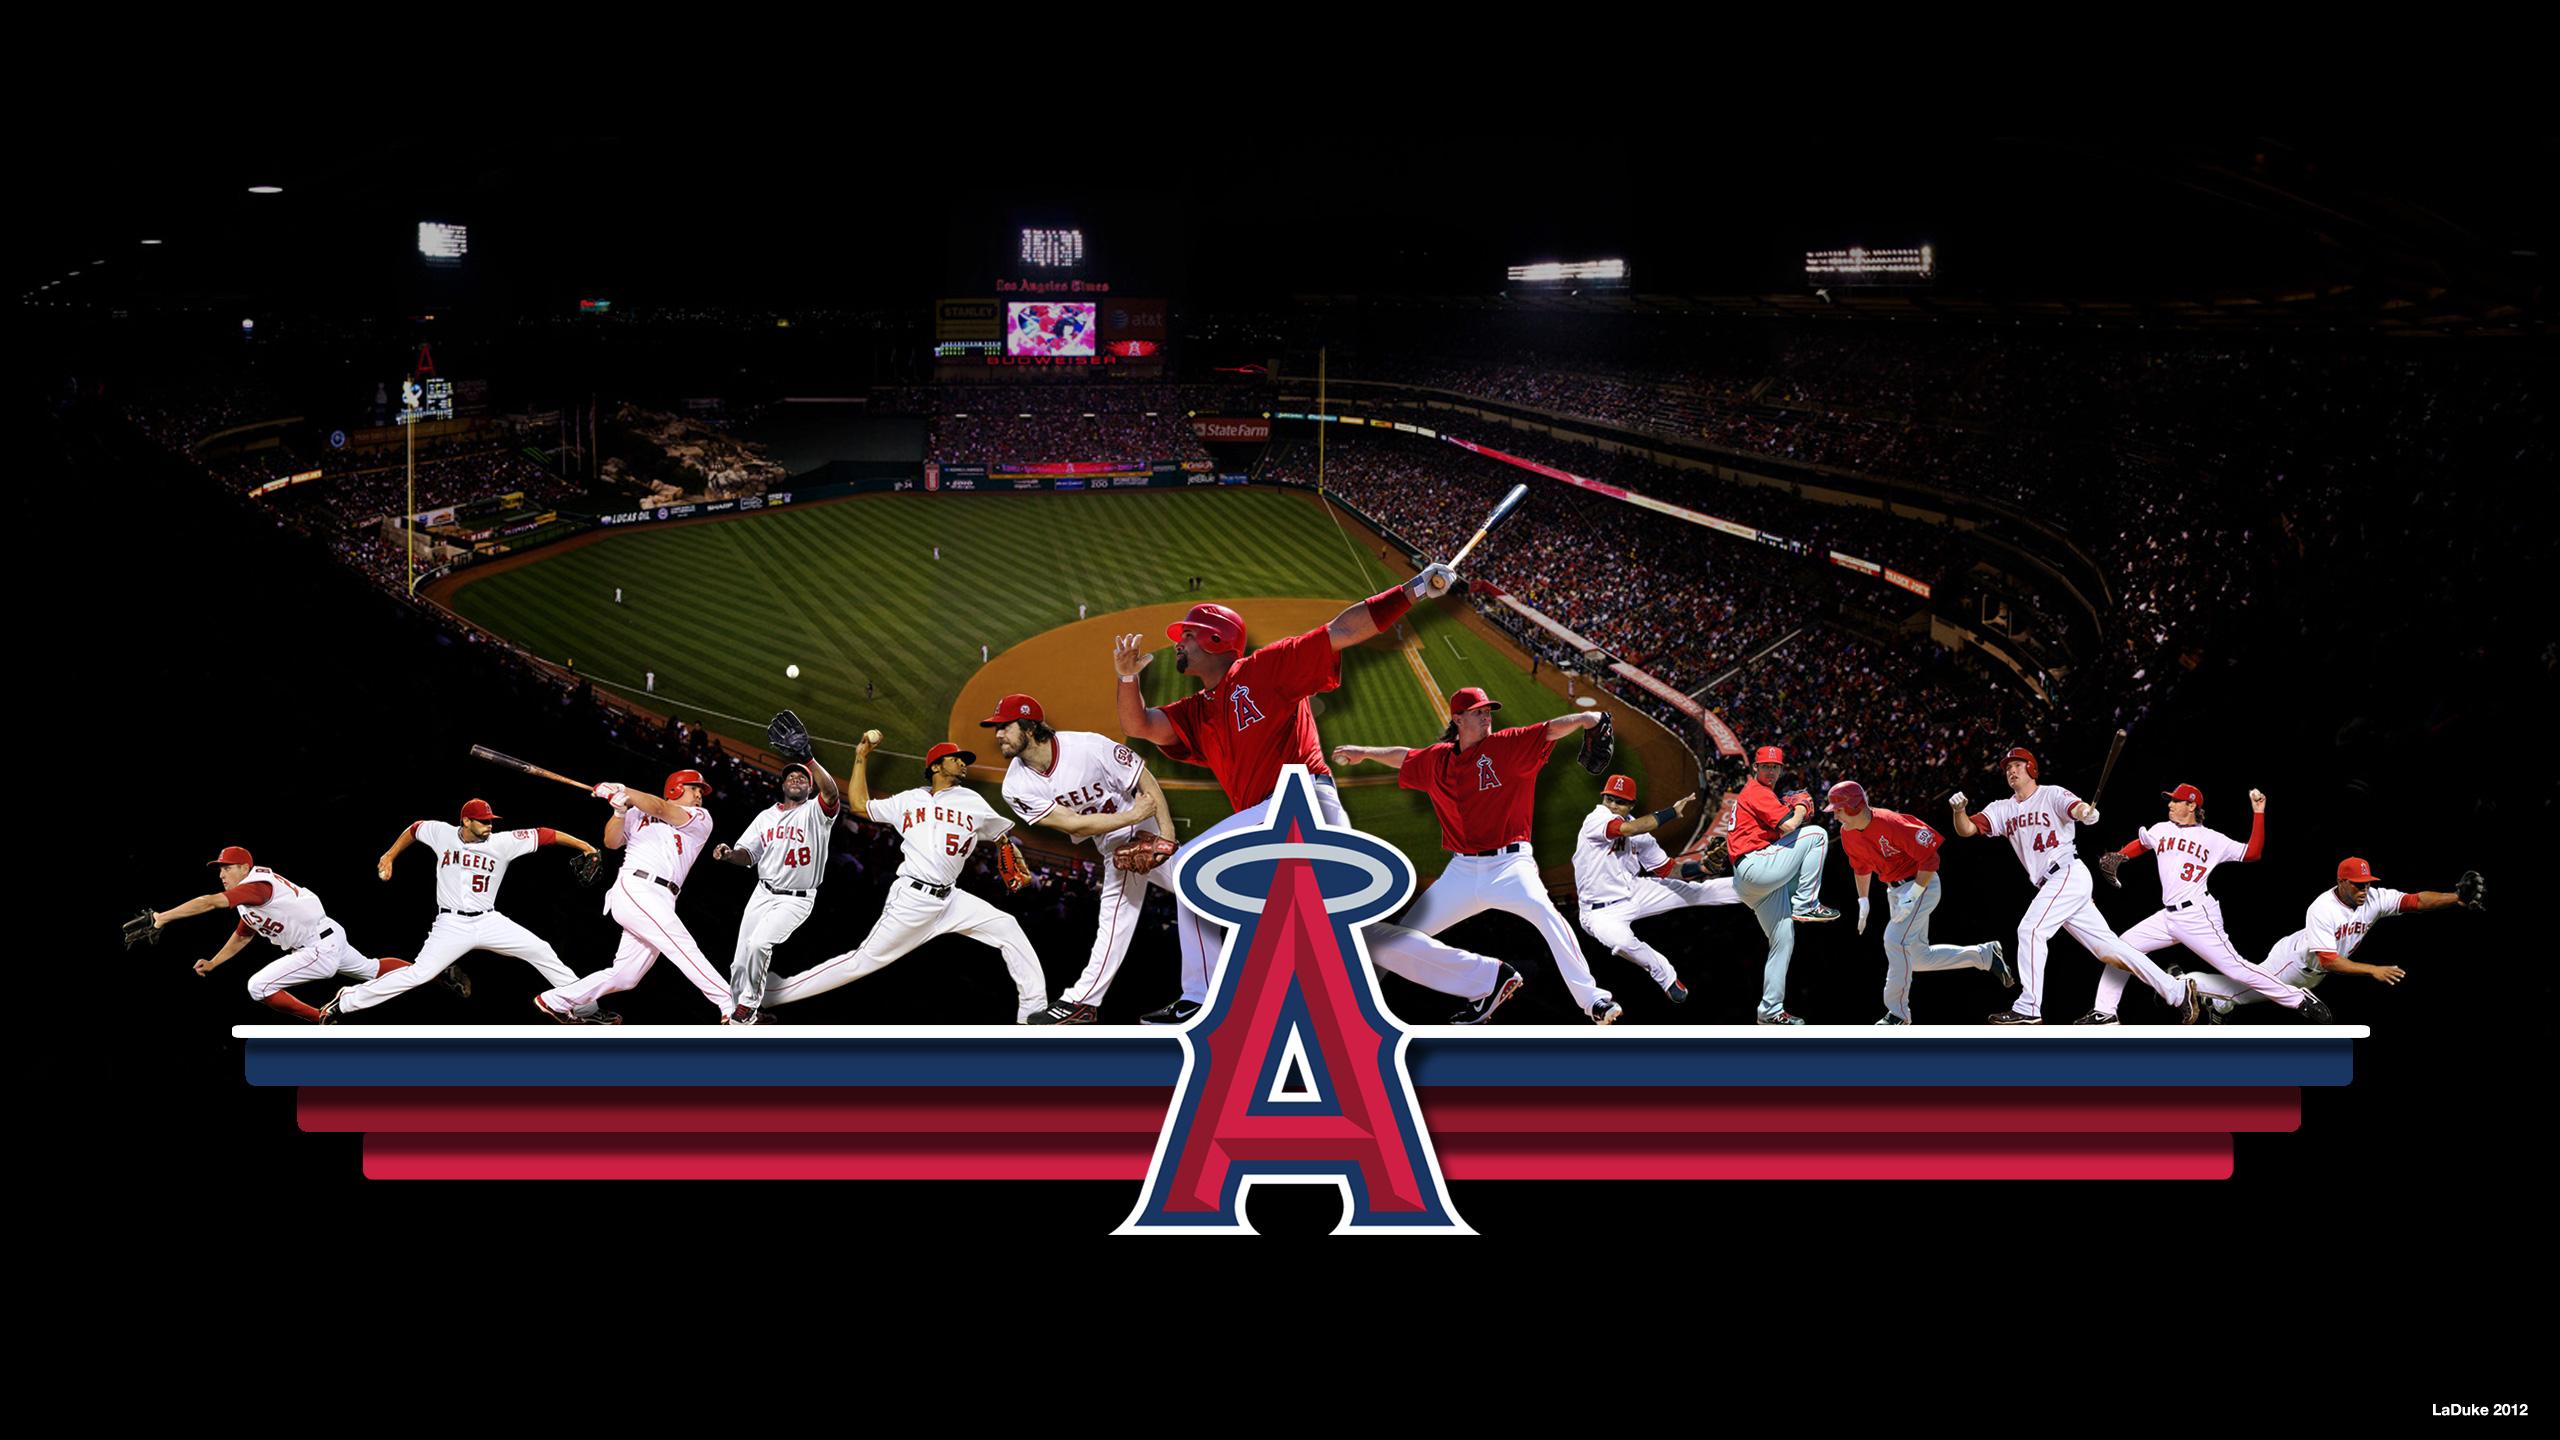 ANAHEIM ANGELS baseball mlb s wallpaper 2560x1440 158485 2560x1440